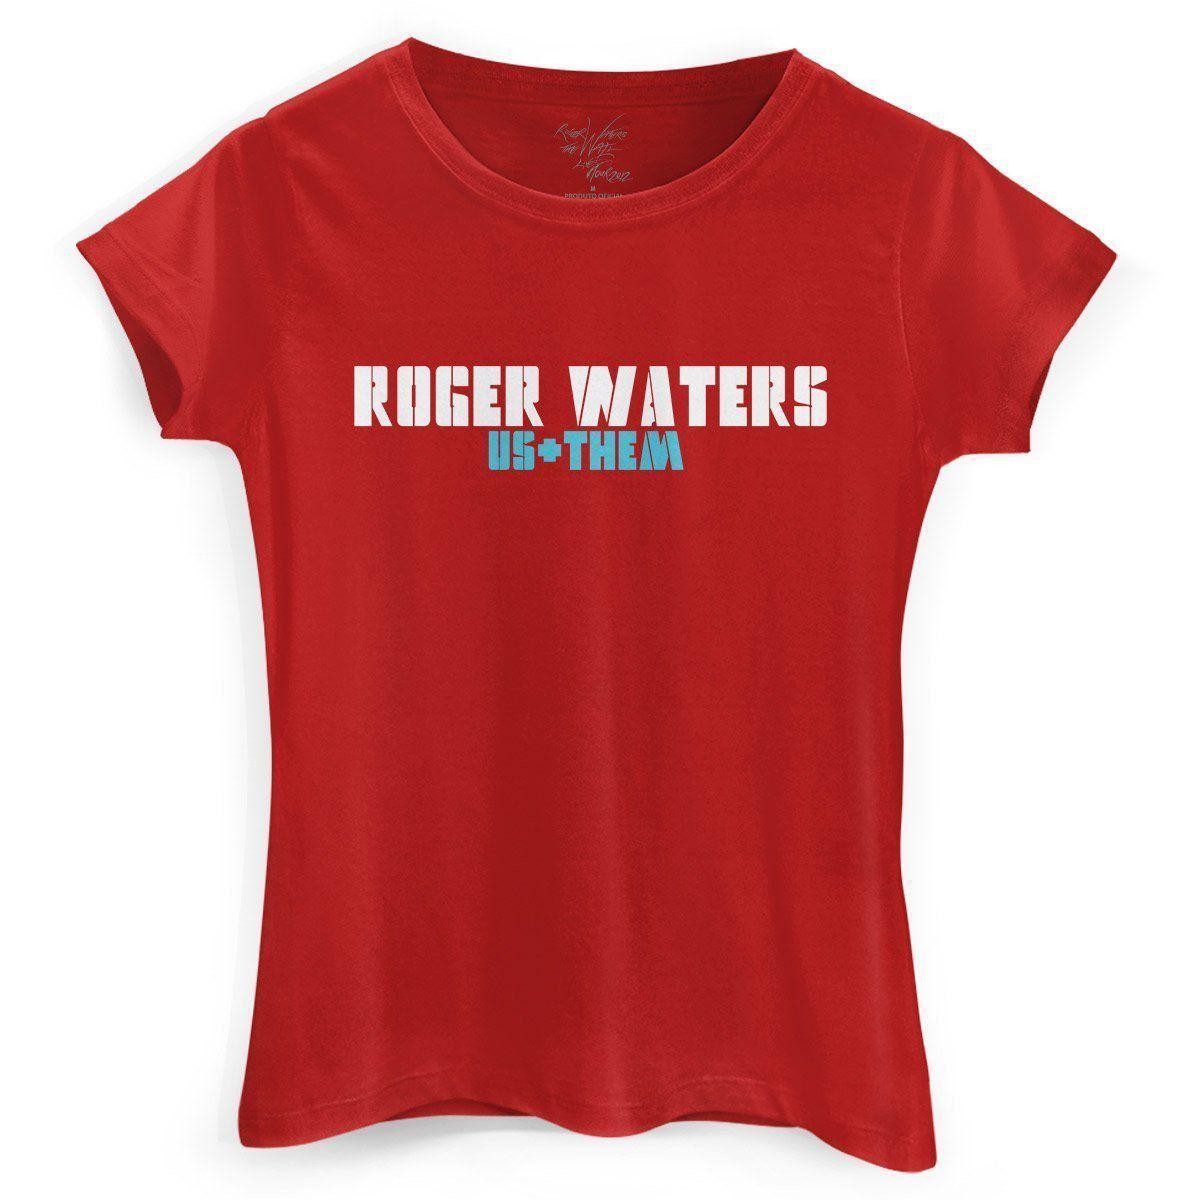 Camiseta Feminina Roger Waters US + Them Tour  - bandUP Store Marketplace